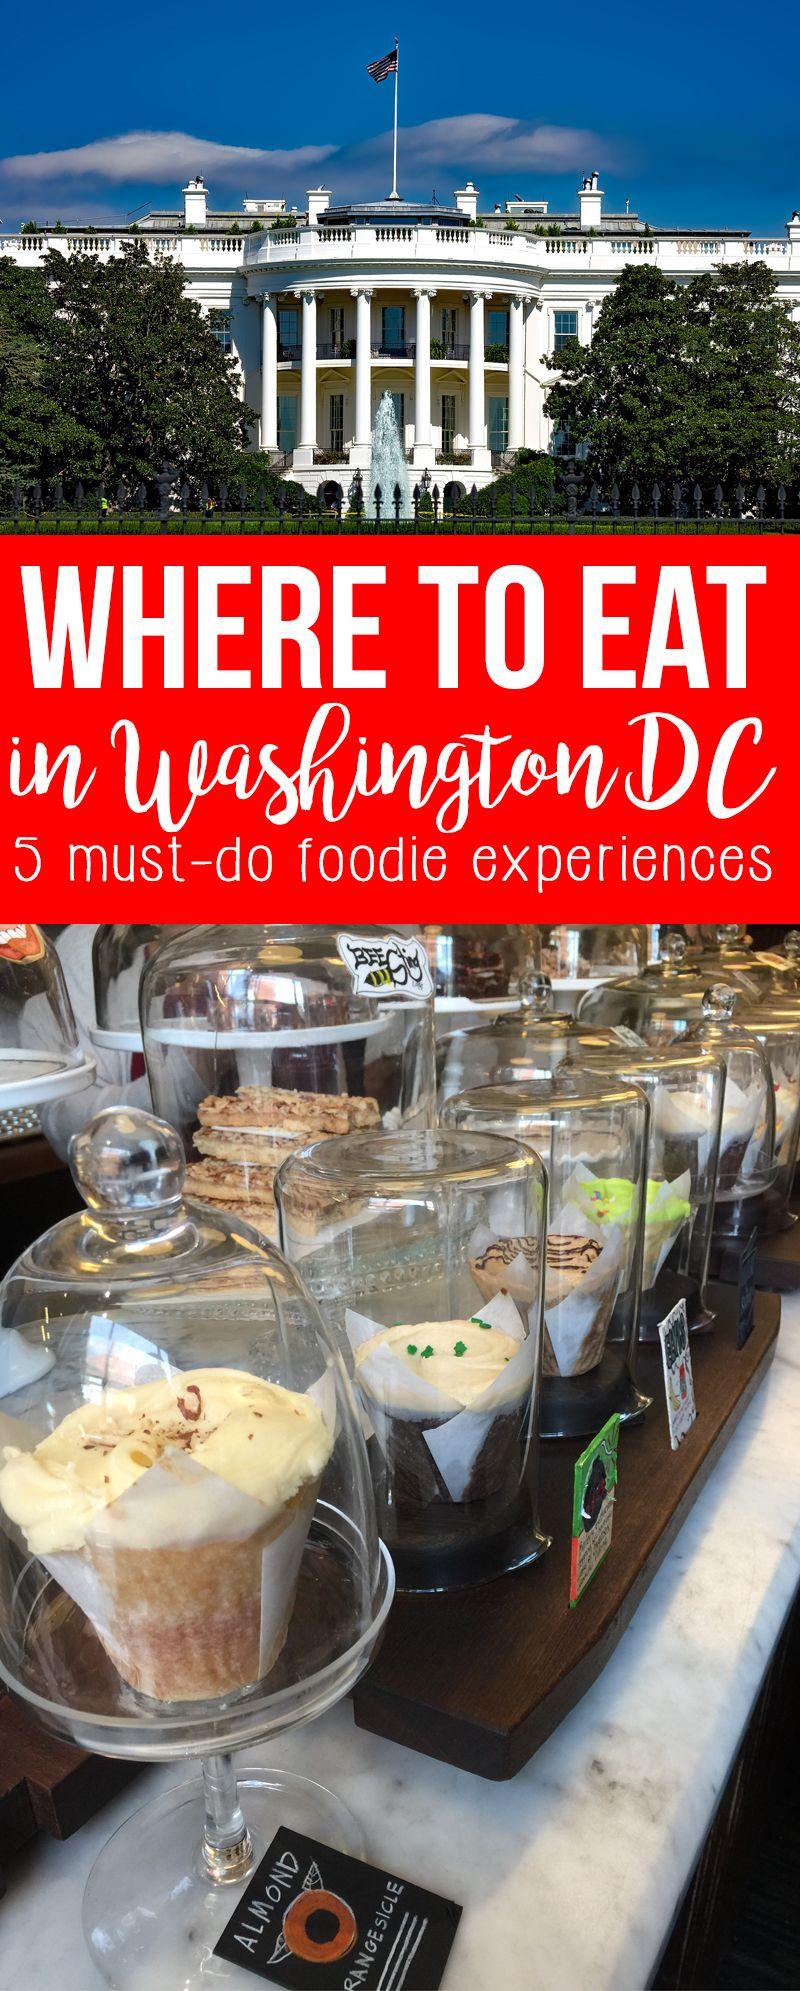 Best Restaurants in Washington DC - 5 Must-Do Foodie Experiences | Washington  dc travel, Washington dc vacation, Dc vacation